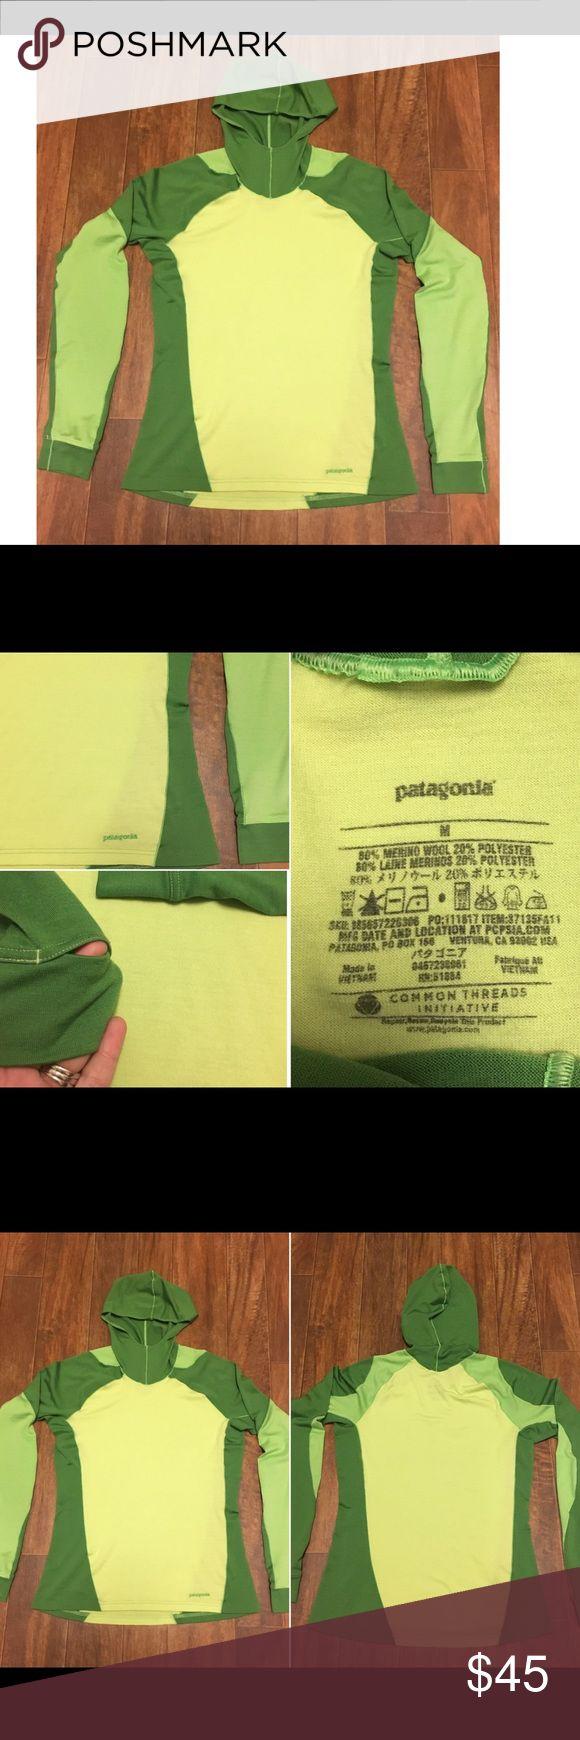 Patagonia hoodie sweatshirt Pre owned• no stains or holes• has thumb holes on sleeves • size Medium • 80% Merino wool 20% polyester • in like new condition! Patagonia Tops Sweatshirts & Hoodies